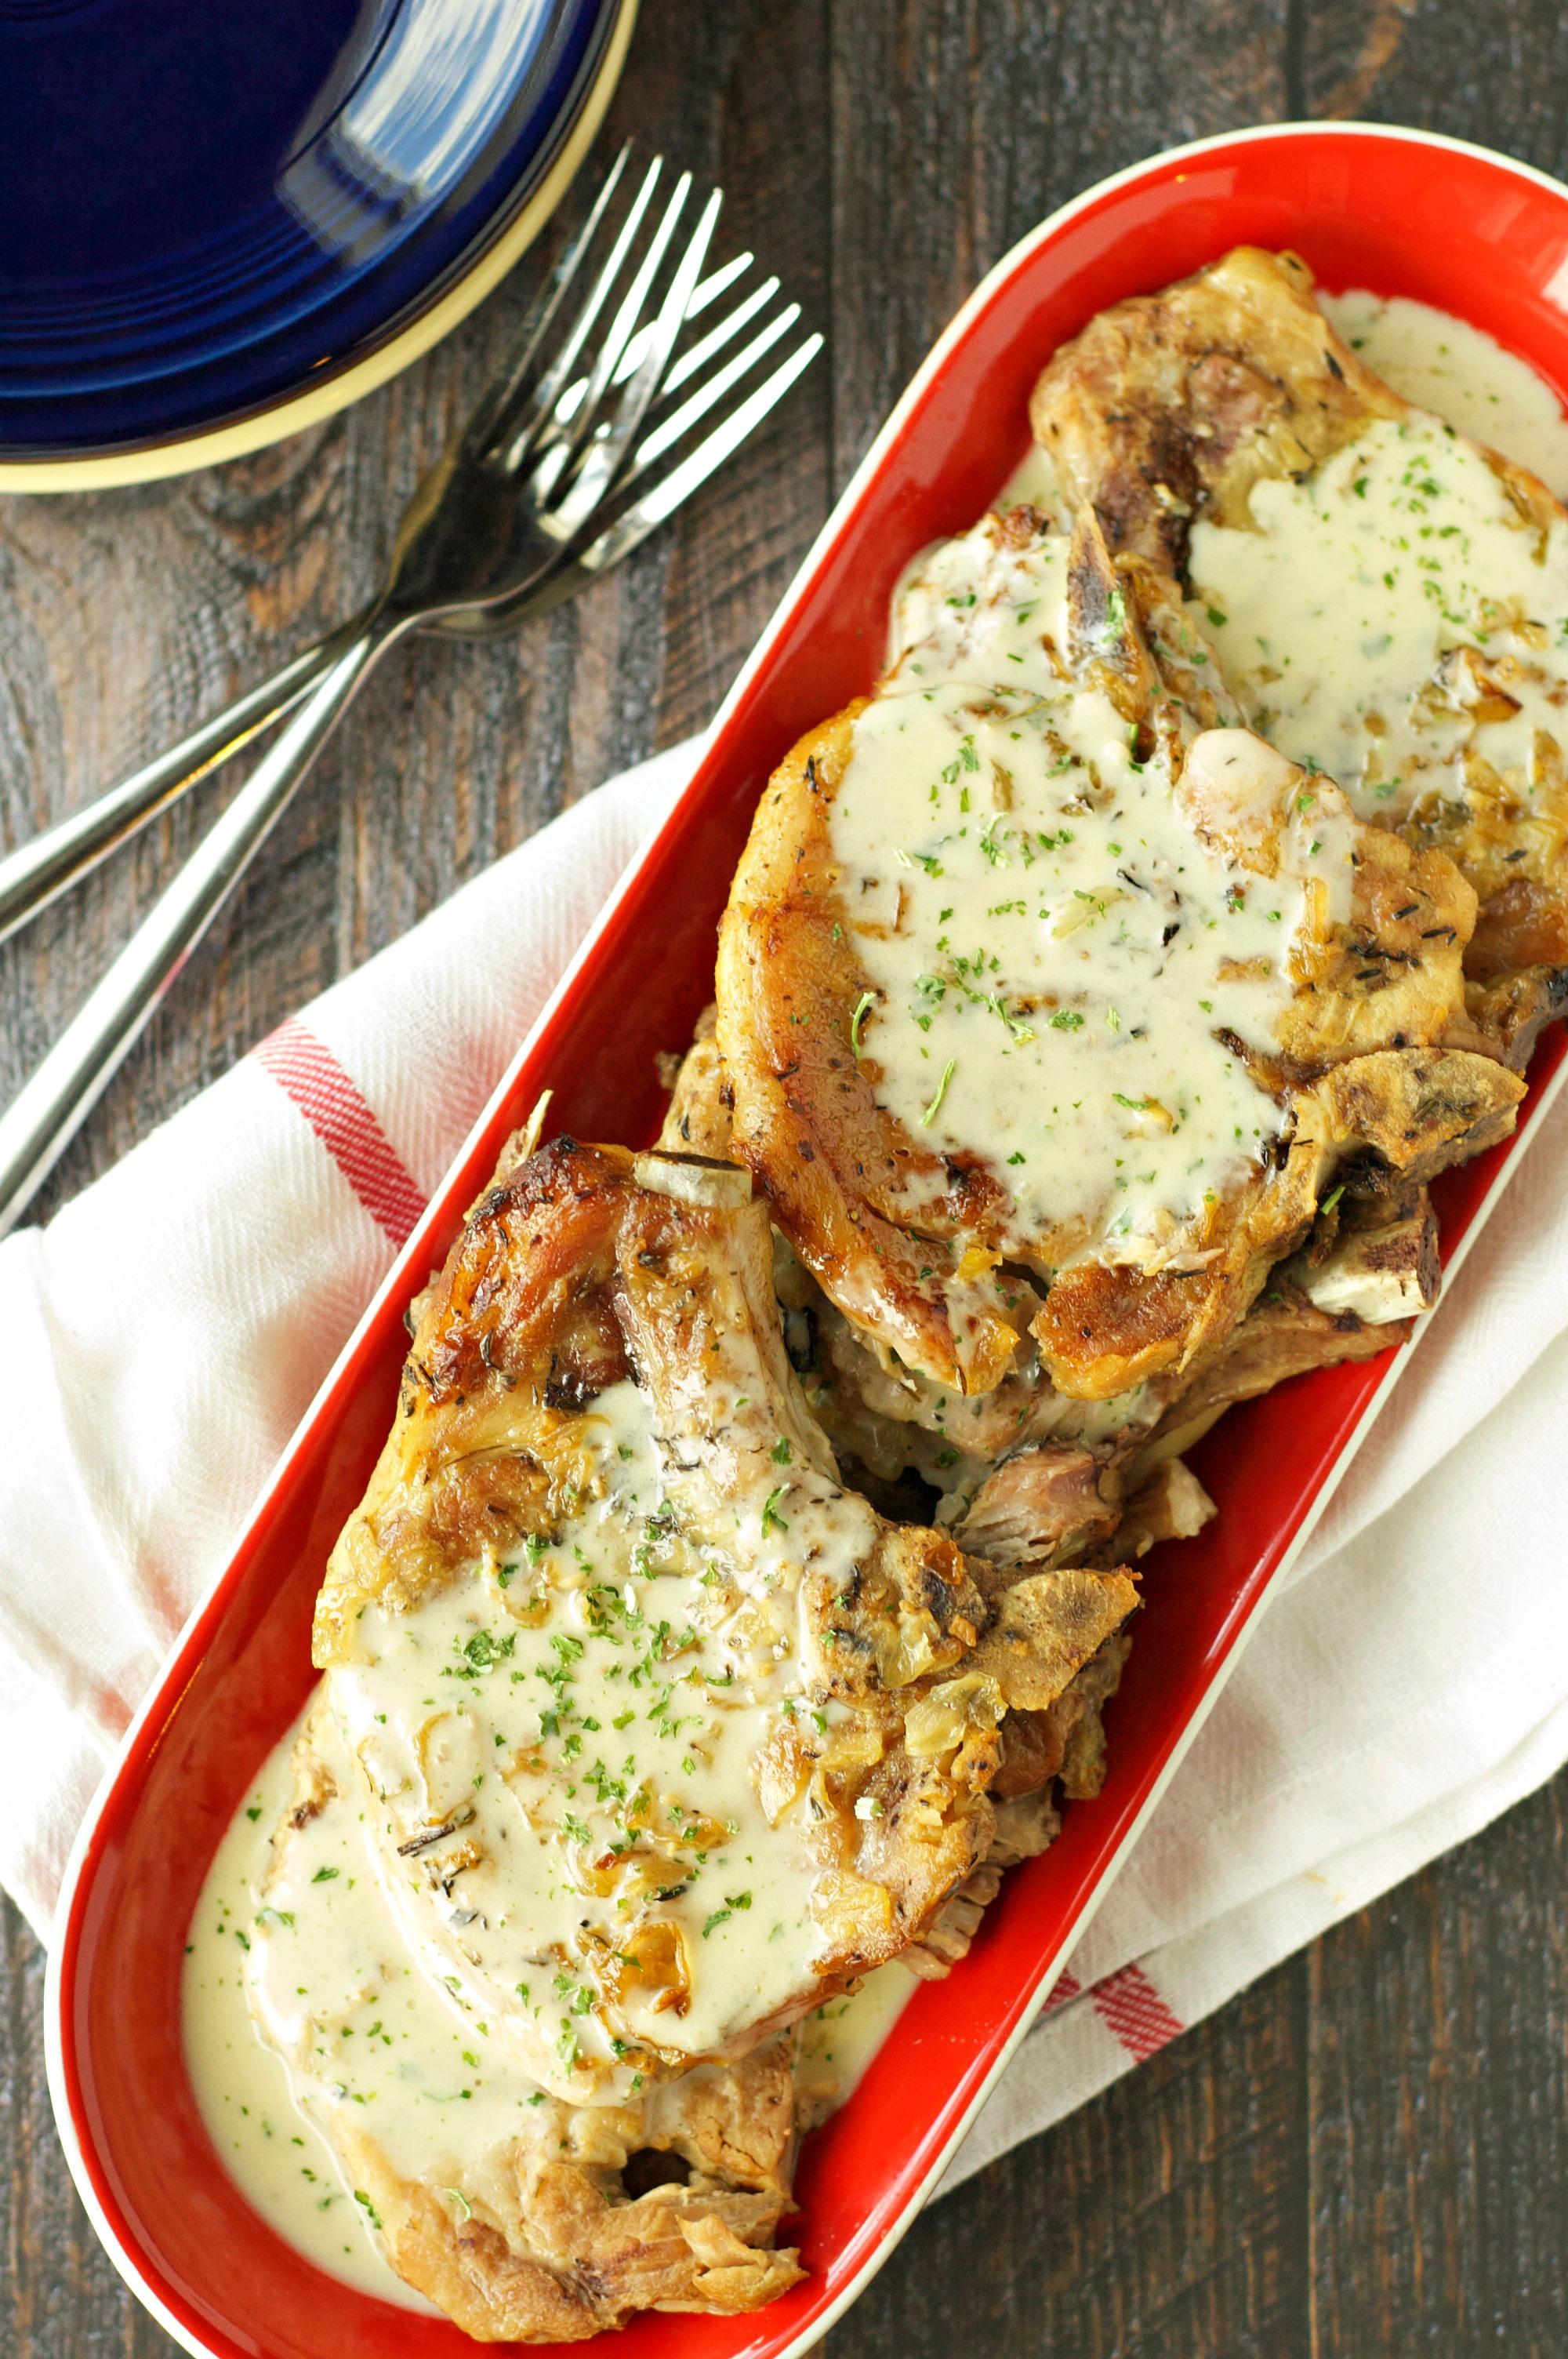 Crockpot Pork Chops With Creamy Herb Sauce